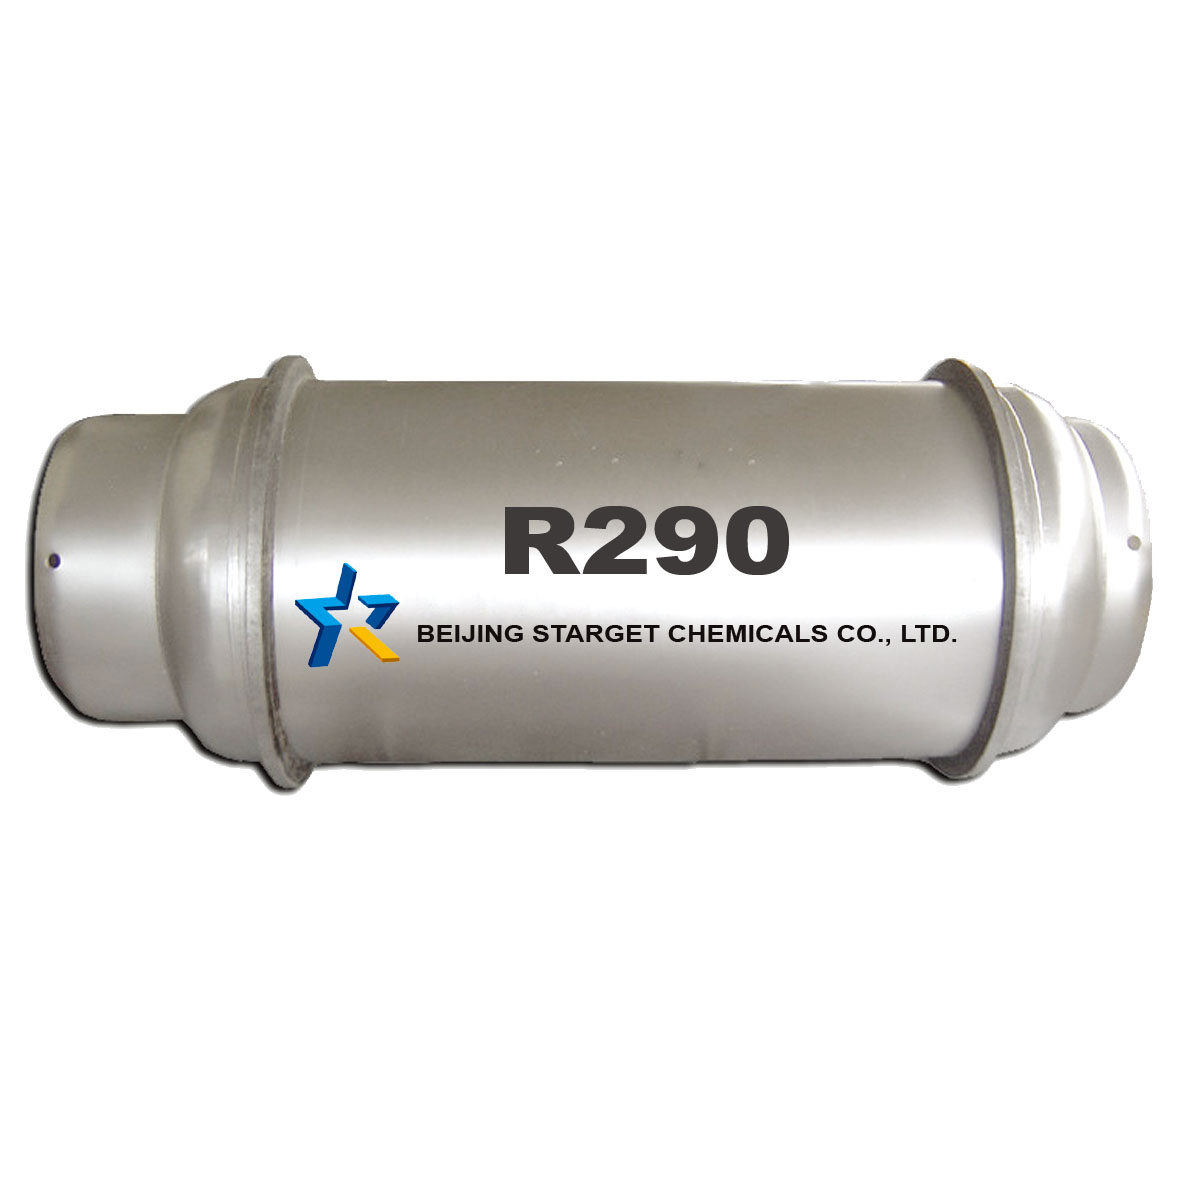 Refrigerant R290